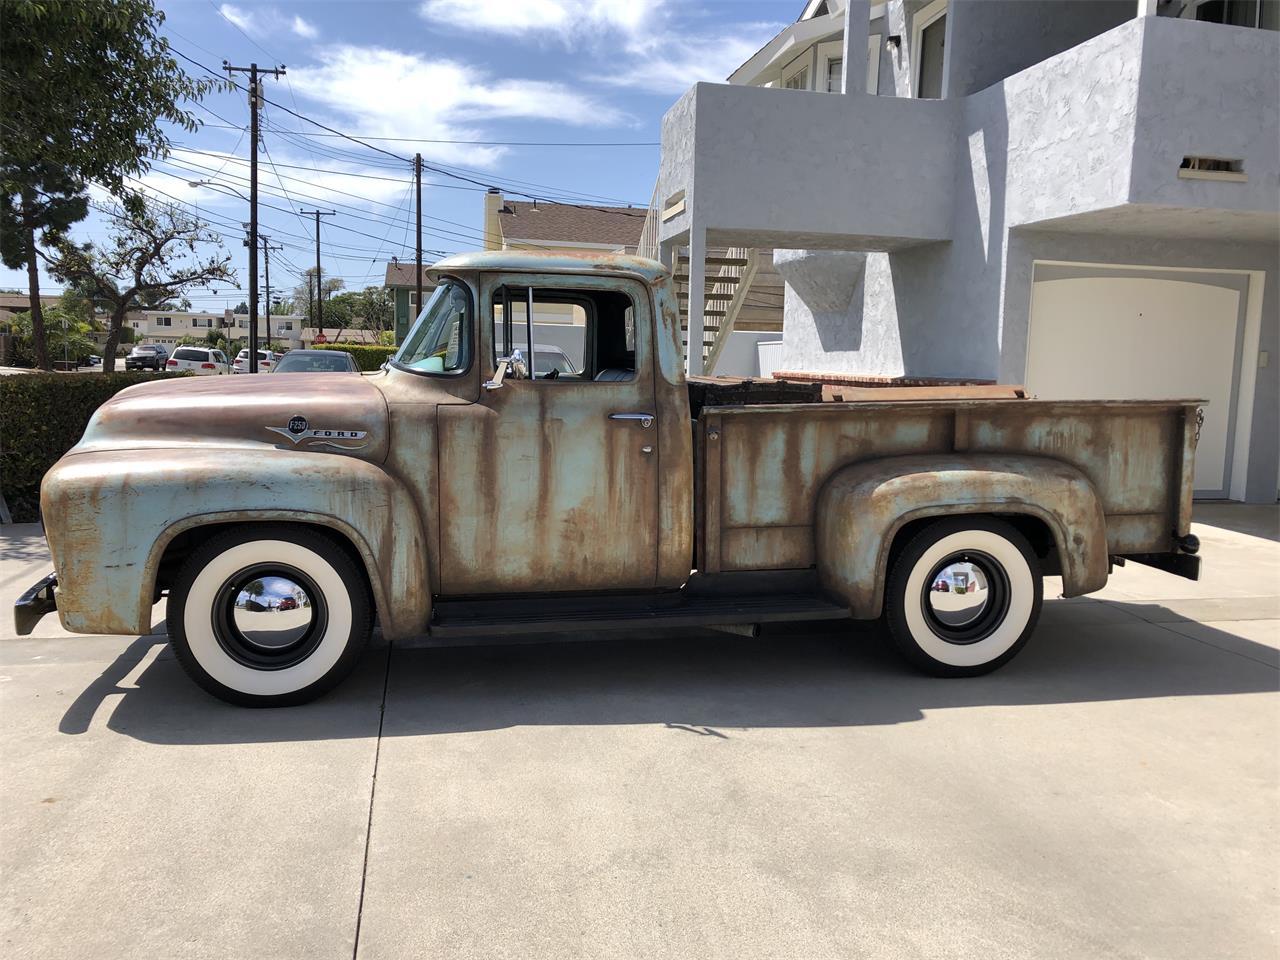 for sale 1956 ford f250 in orange, california cars - orange, ca at geebo